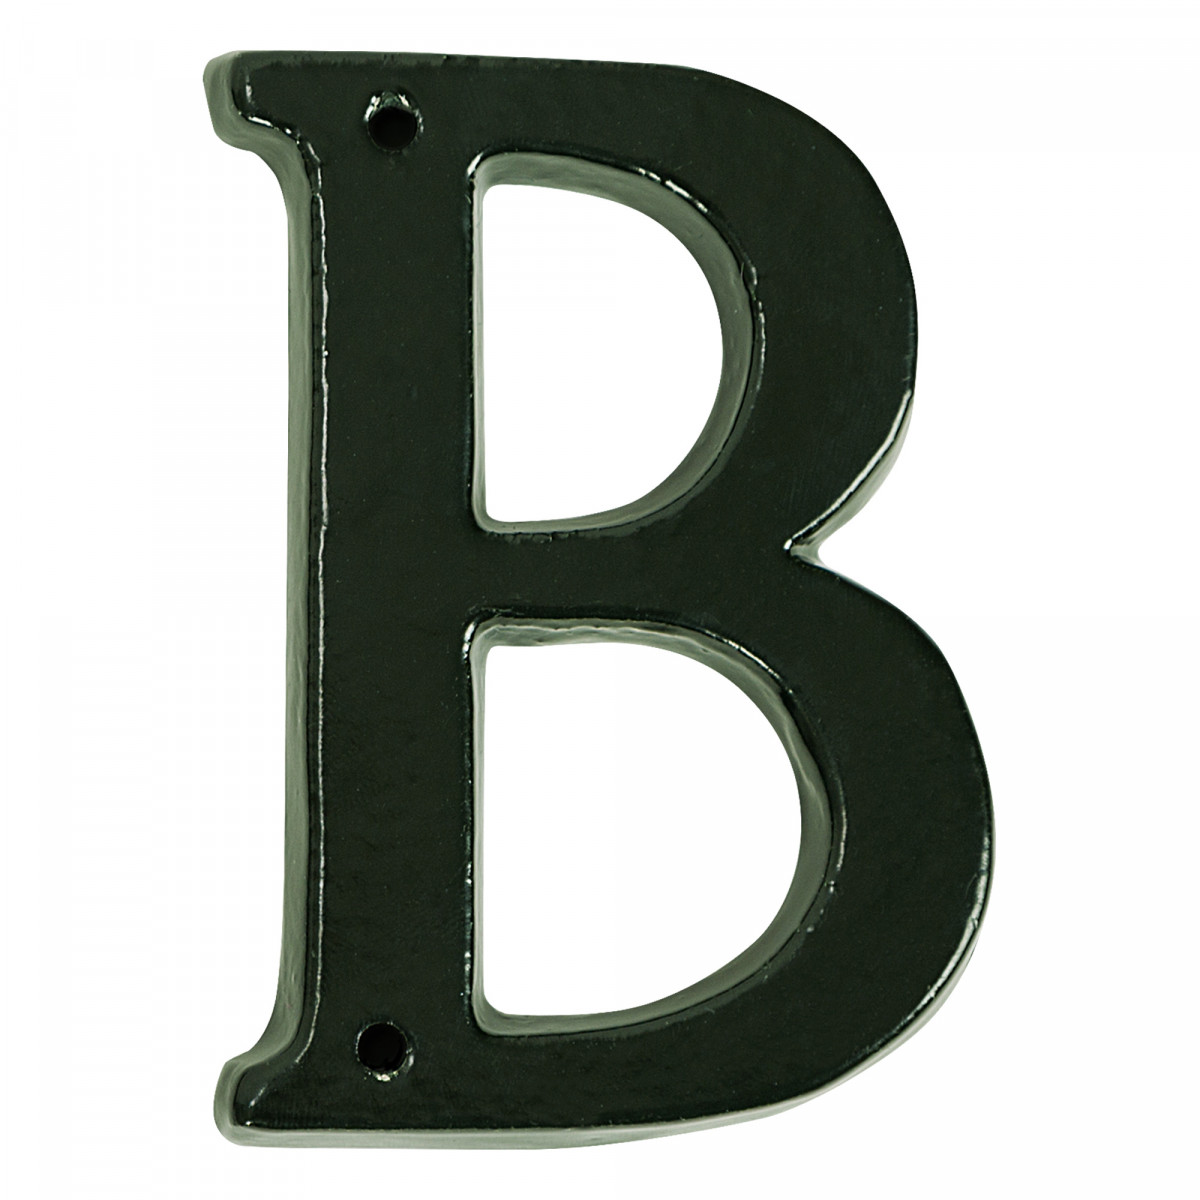 Huisnummer toevoeging B (5860B) - KS Verlichting - Huisnummers